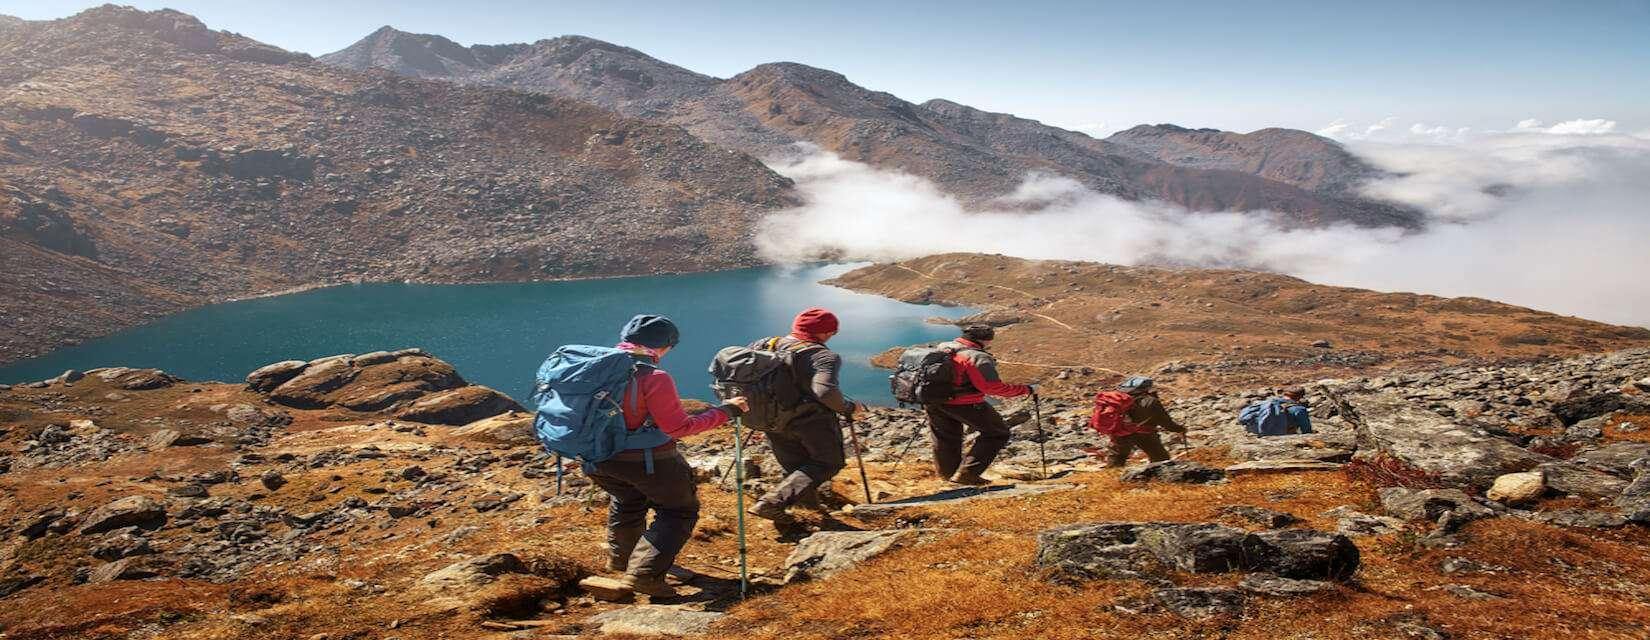 Travel Info - Himalayan Frozen Adventure